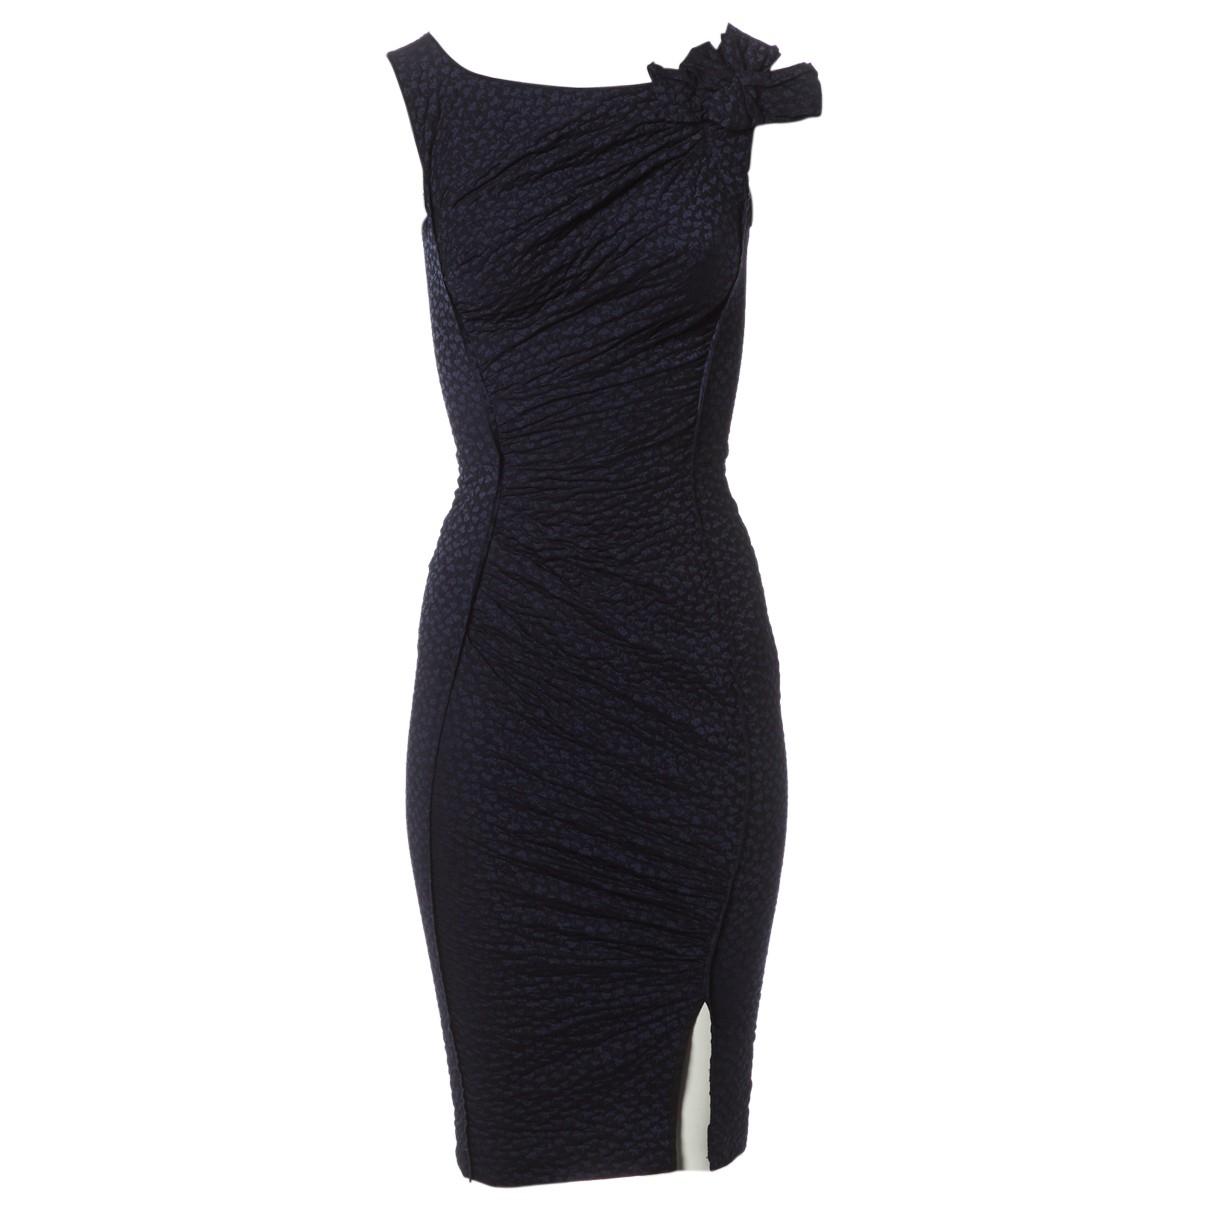 Nina Ricci \N Kleid in  Schwarz Polyester